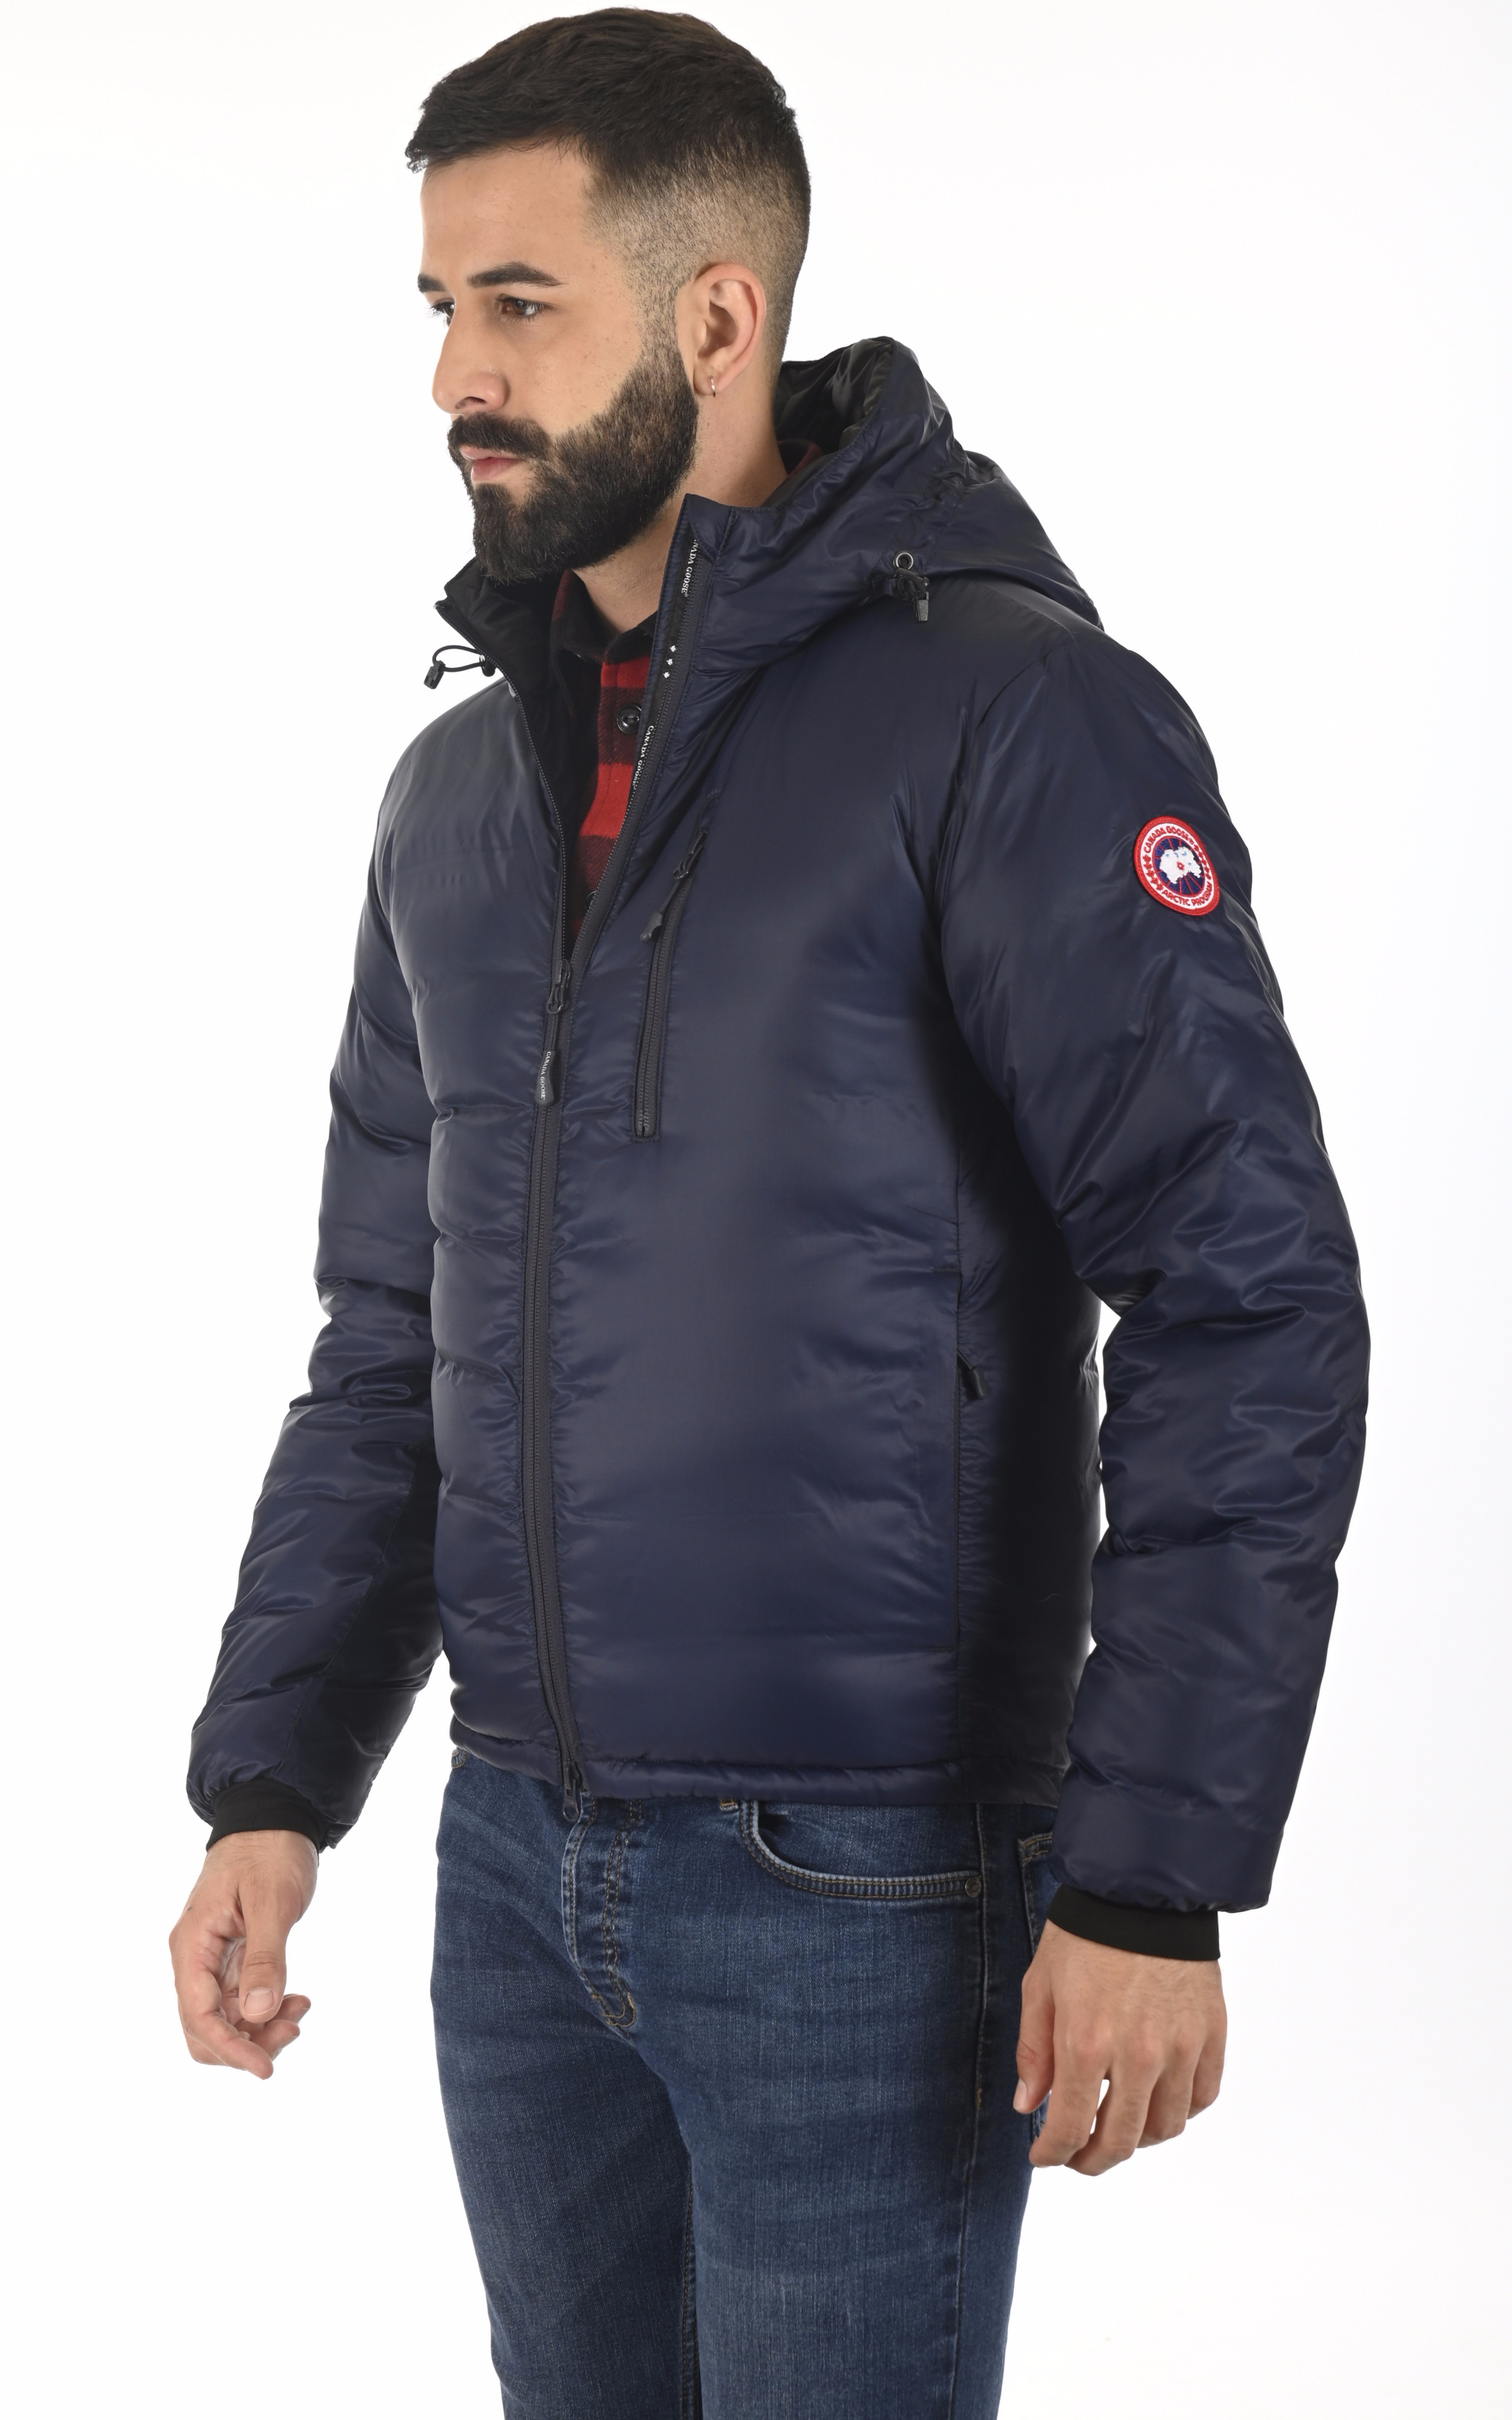 Doudoune fine Lodge admiral blue Canada Goose